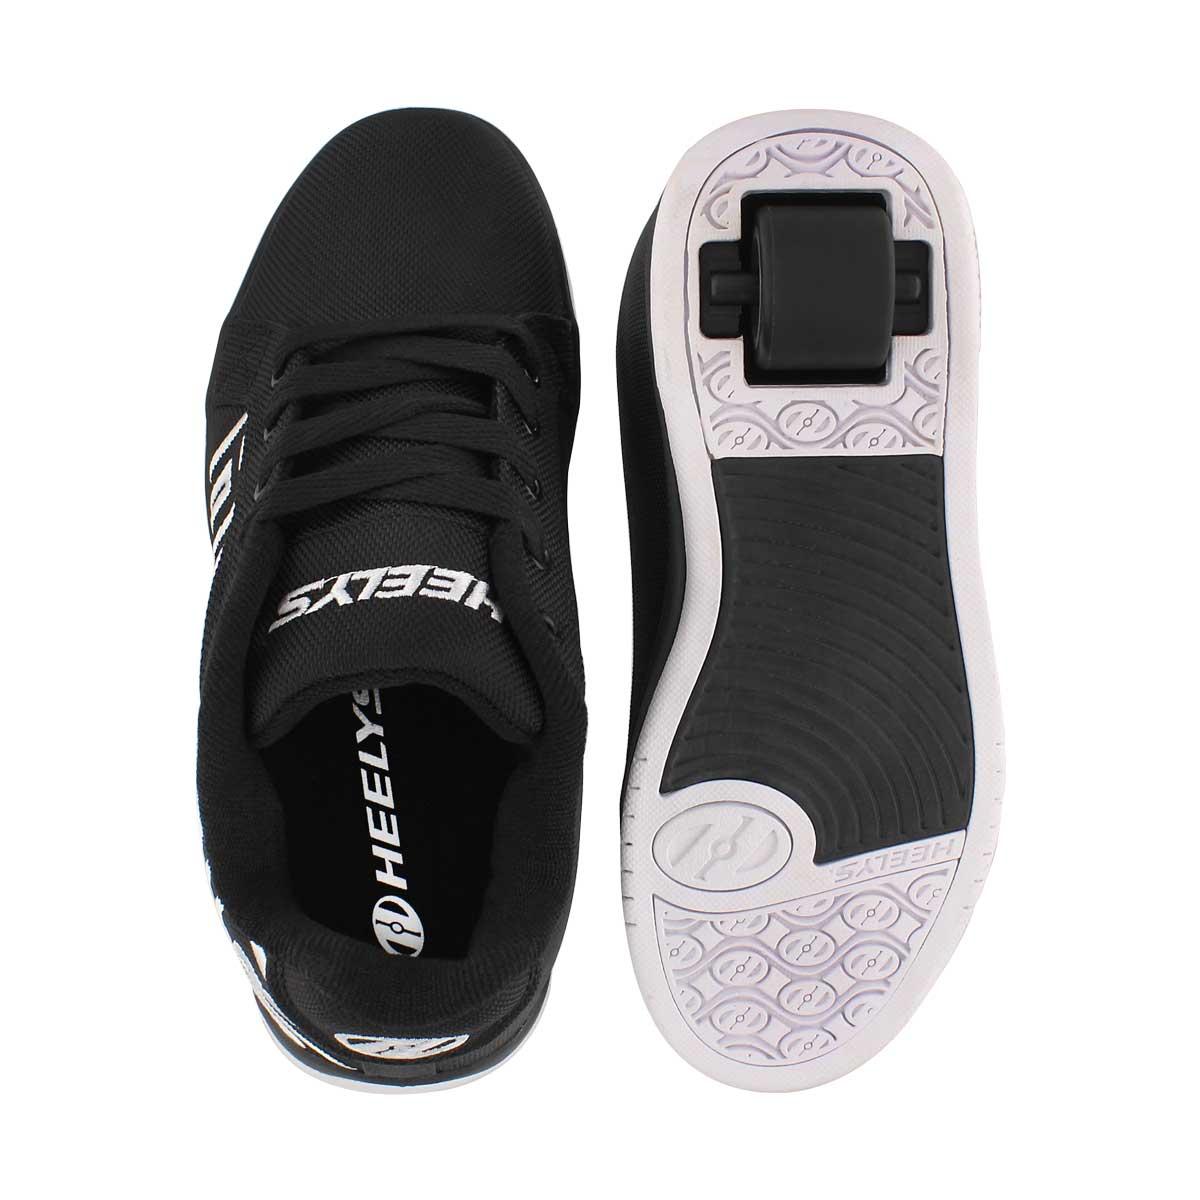 Bys Split blk/wht skate sneaker